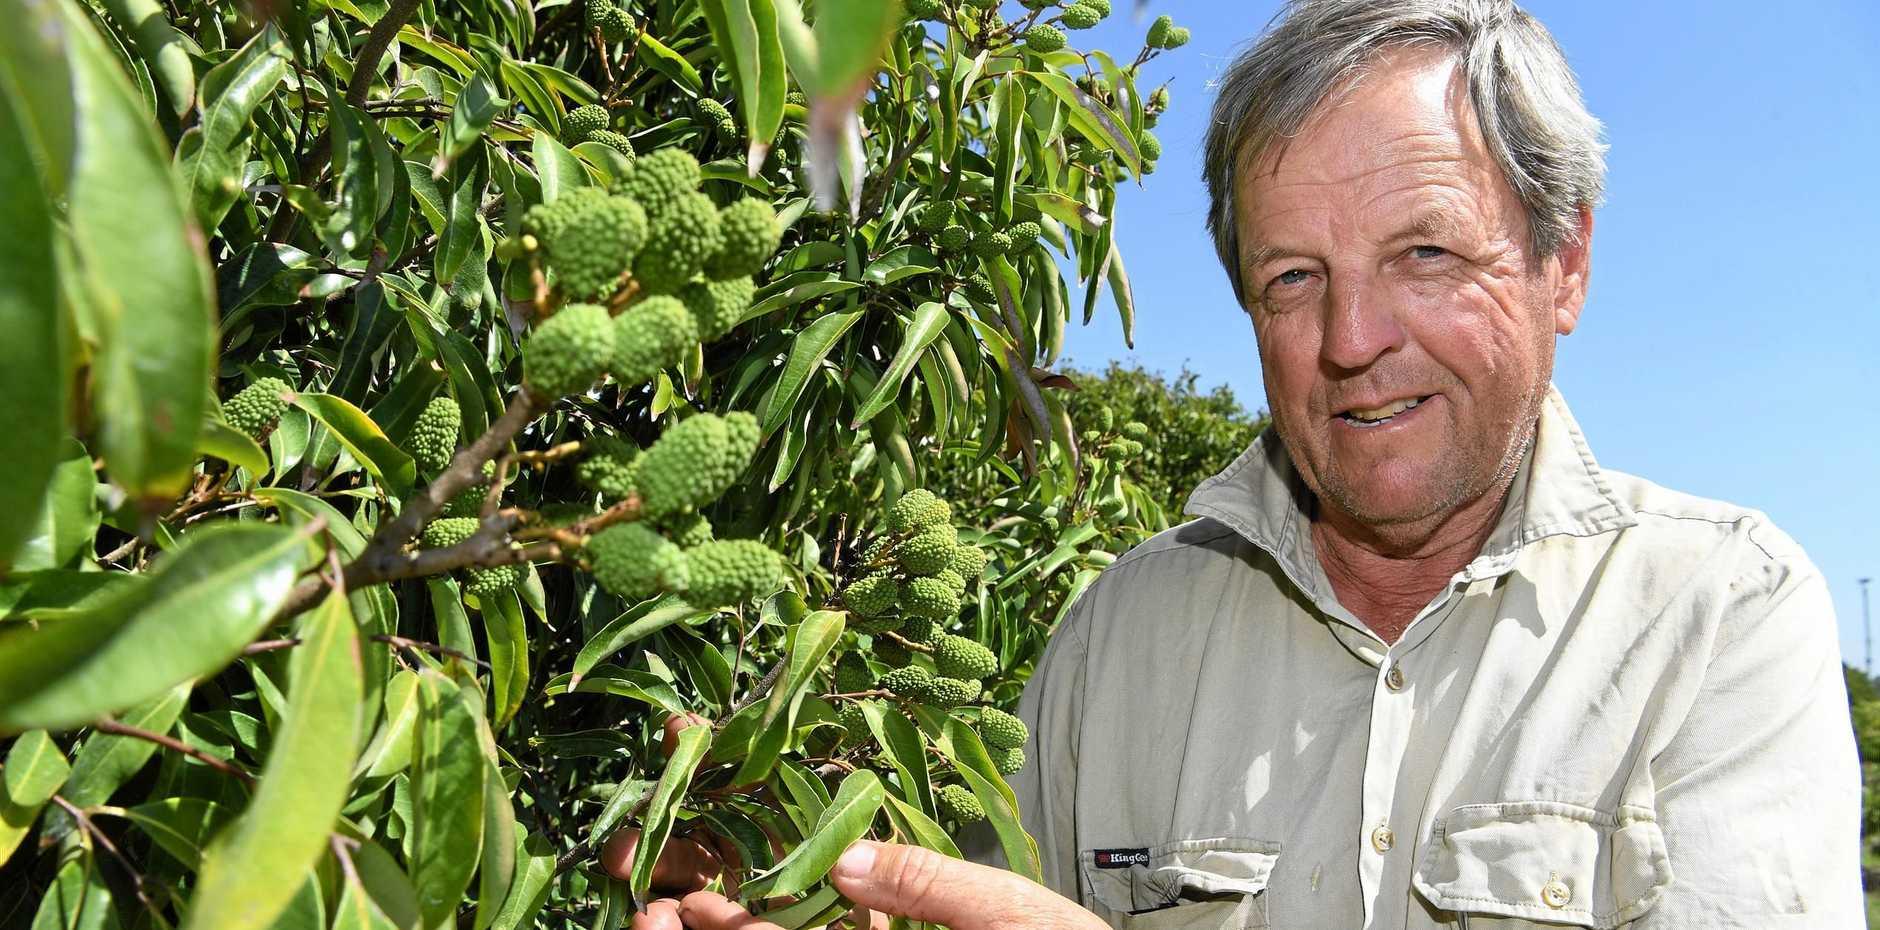 Lychee farmer Derek Foley is expecting a good crop this season.